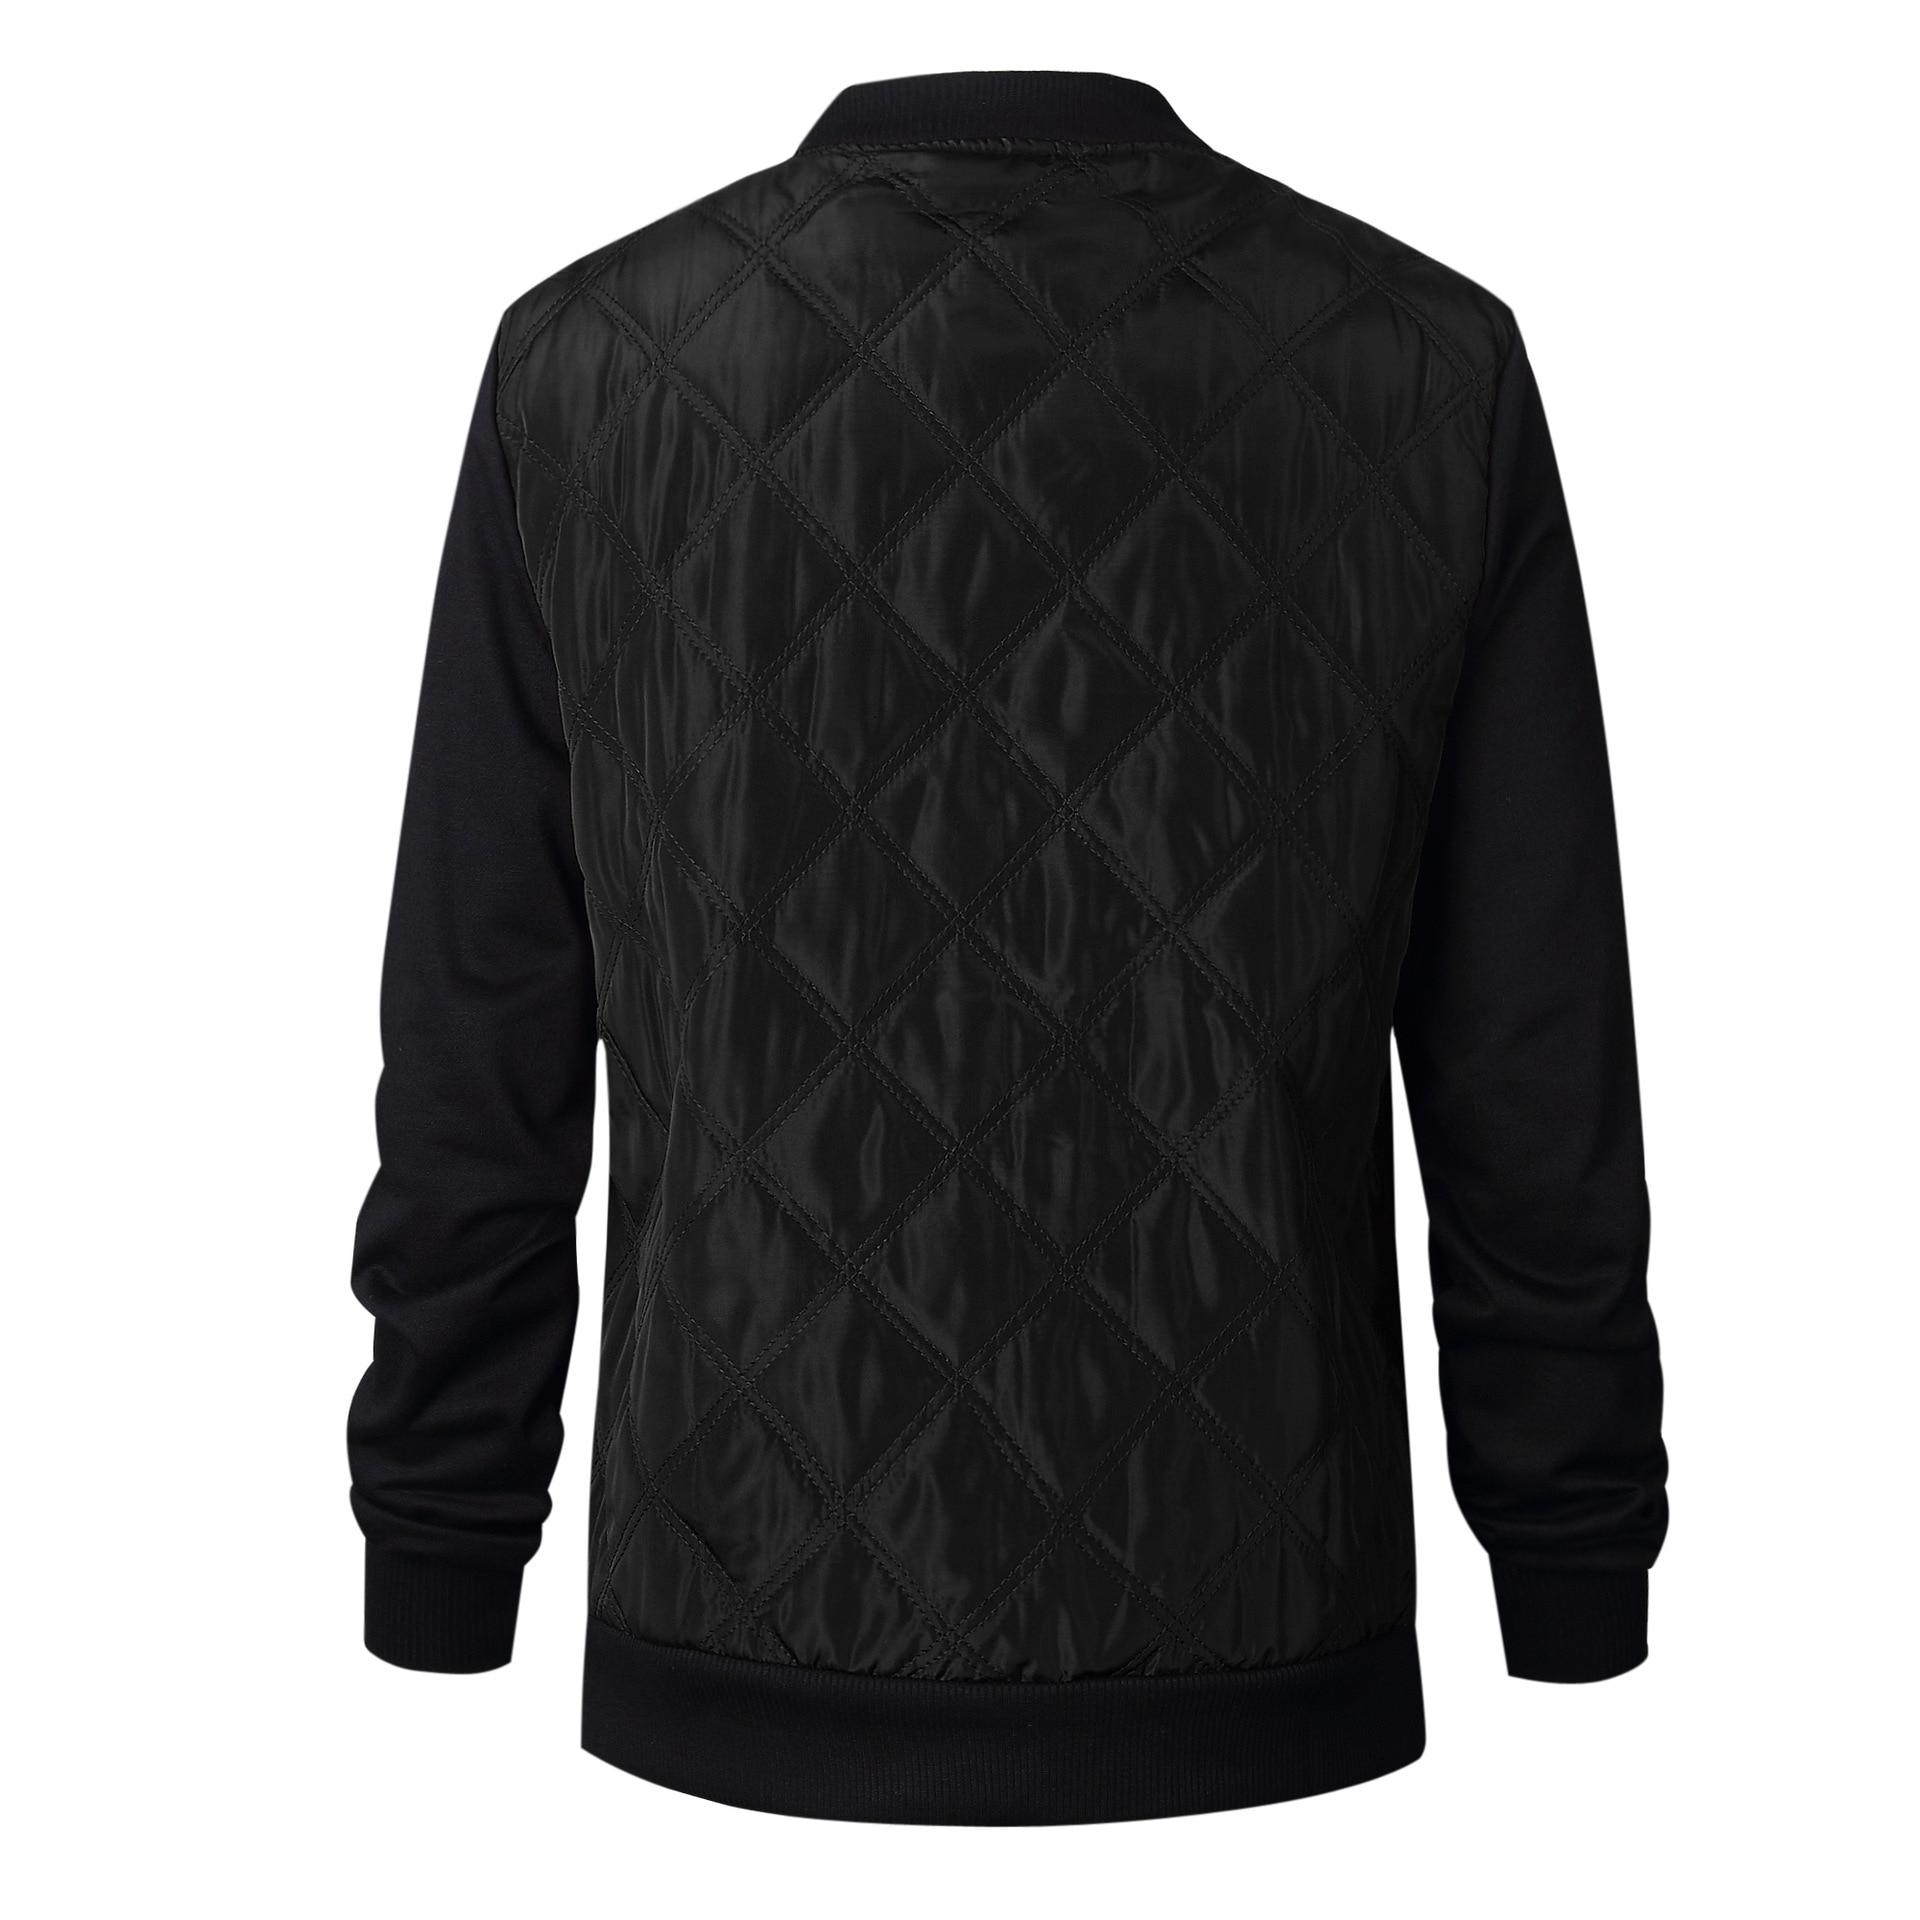 HTB1R0 lw8mWBuNkSndVq6AsApXaD Plus Size Autumn Winter Fashion Slim Women's Jacket Zipper Cardigan Splice Bomber Jackets 2019 Long Sleeve Bodycon Coats Female